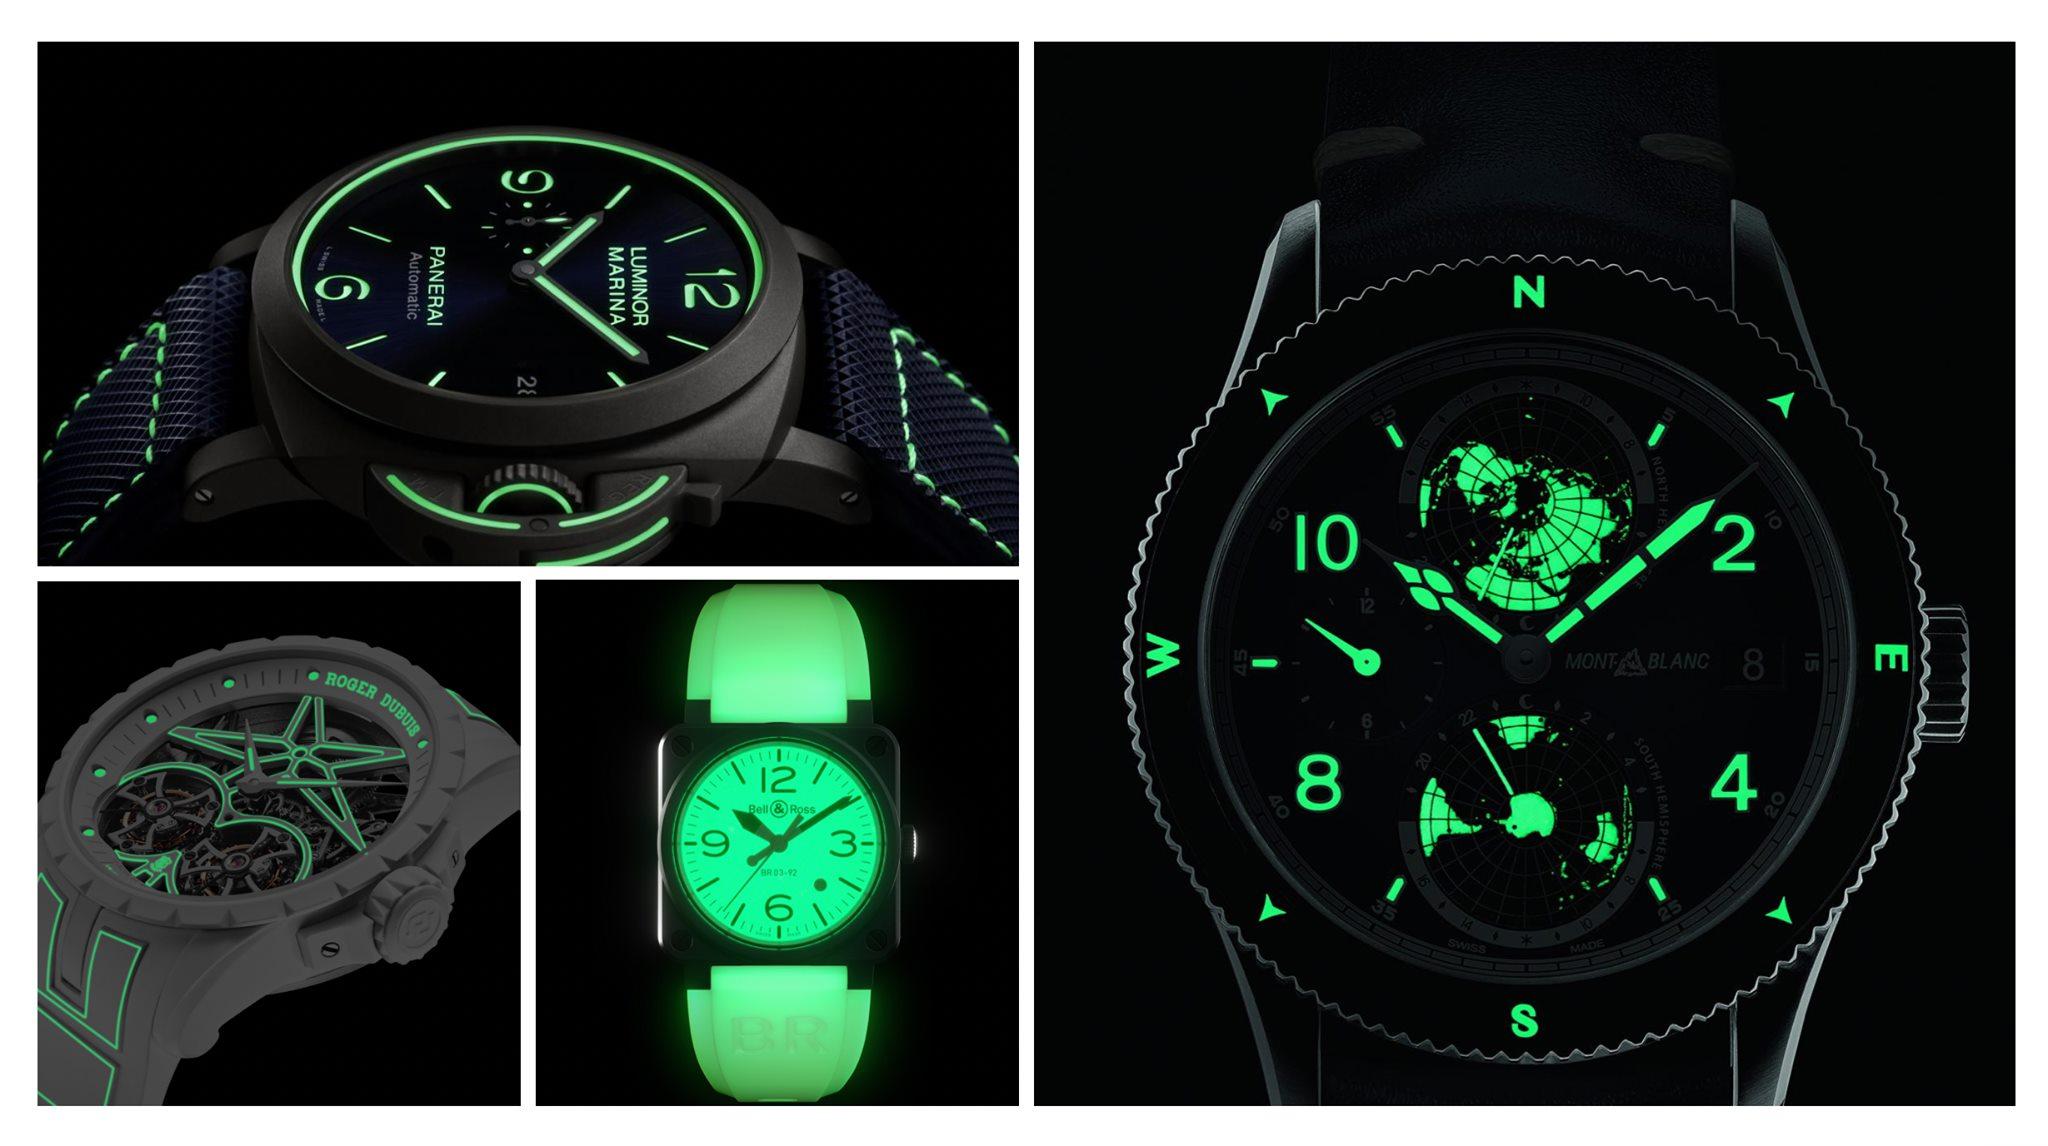 Historia de la Luminiscencia relojera